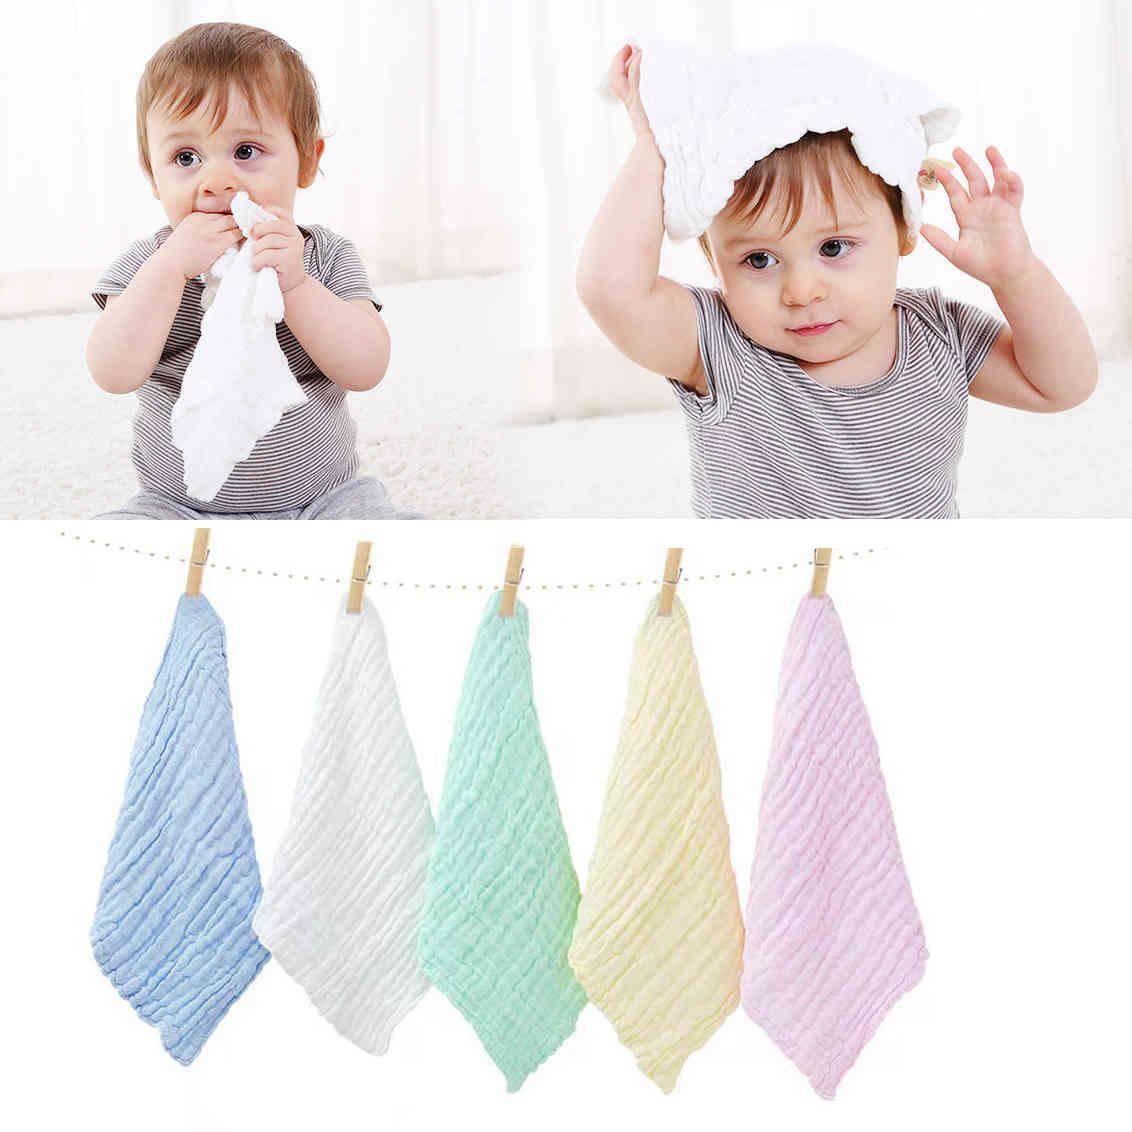 30*30cm 5pcs/set Baby towel 100% Cotton Square Muslin Baby Towels 6 Layers Water Washing Handkerchief born Baby Nursing Towel 210510